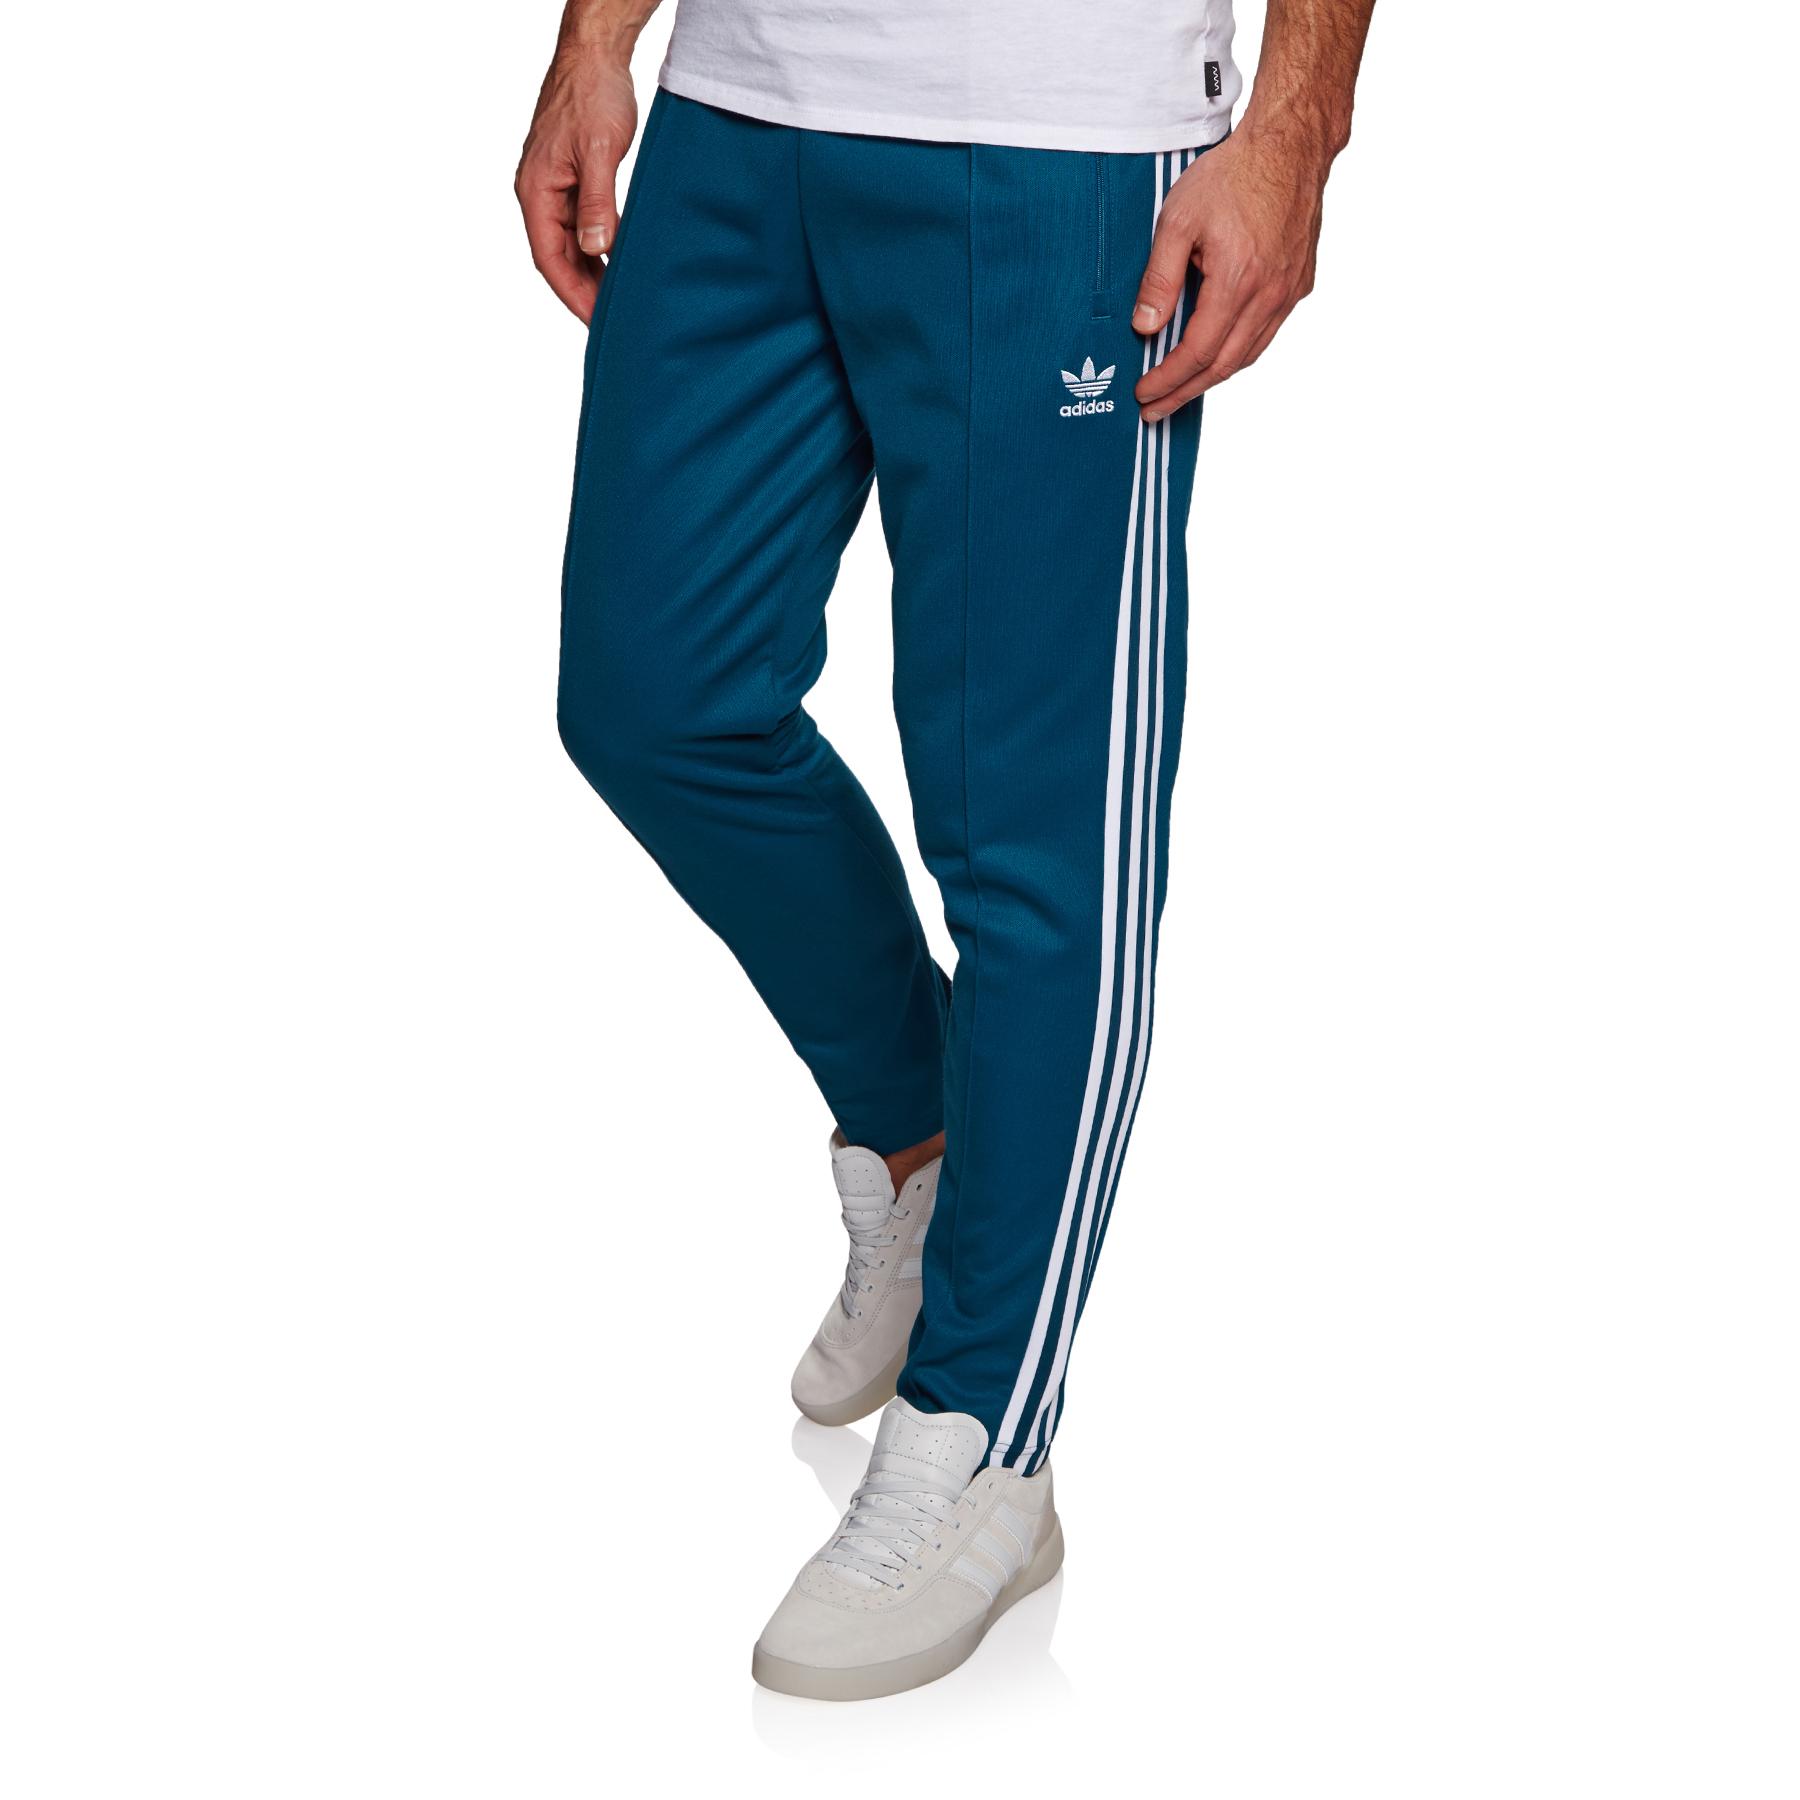 Adidas Originals Beckenbauer Tp Jogging Pants | Free